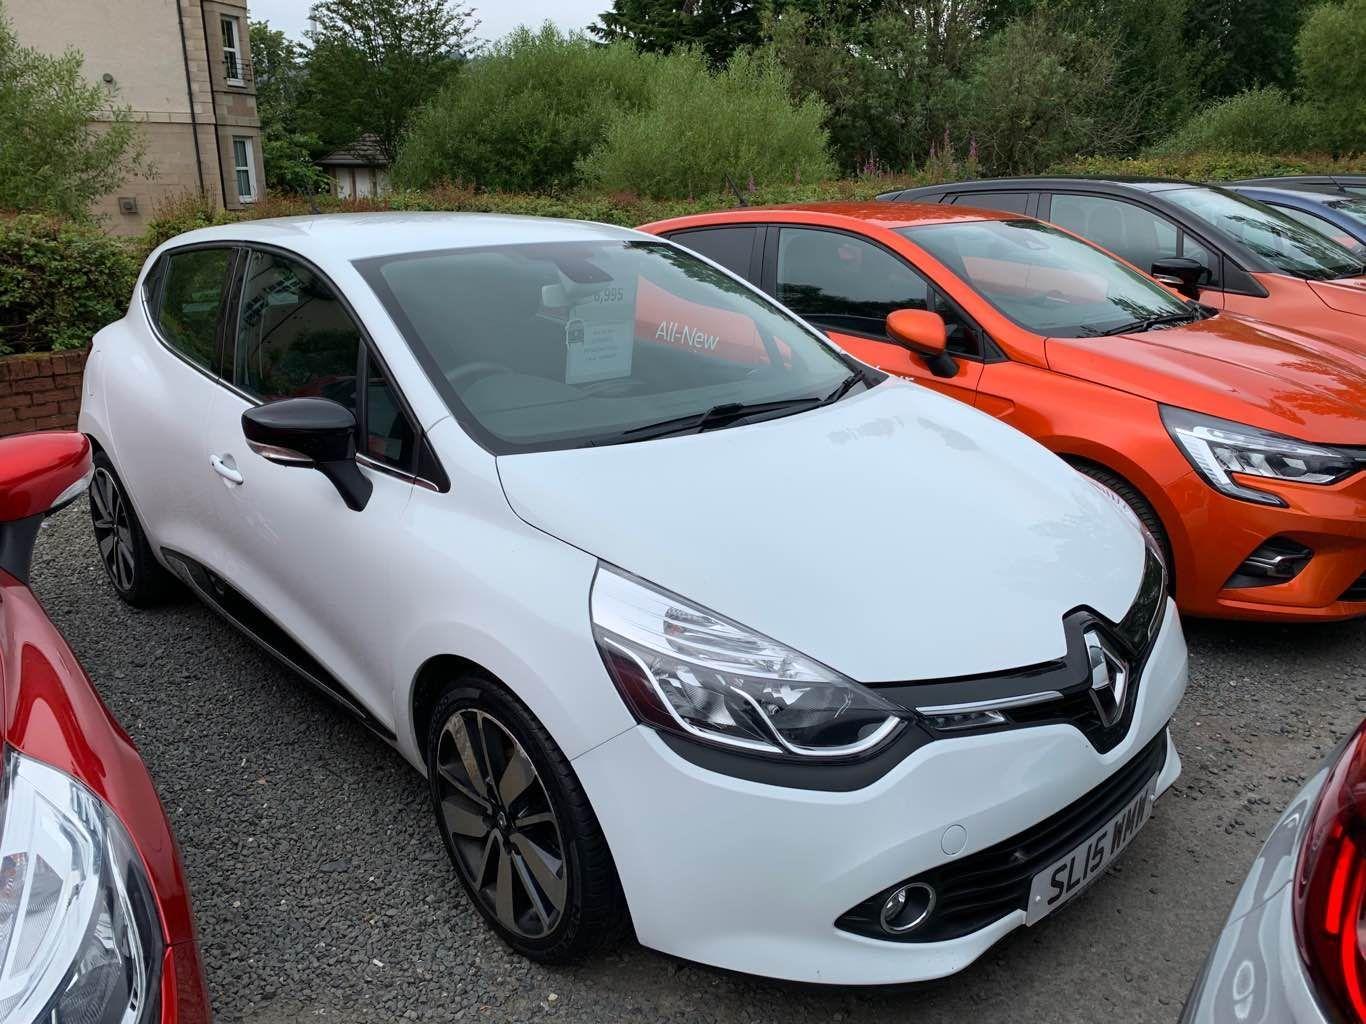 Renault Clio D-que S M-nav Nrg Tc